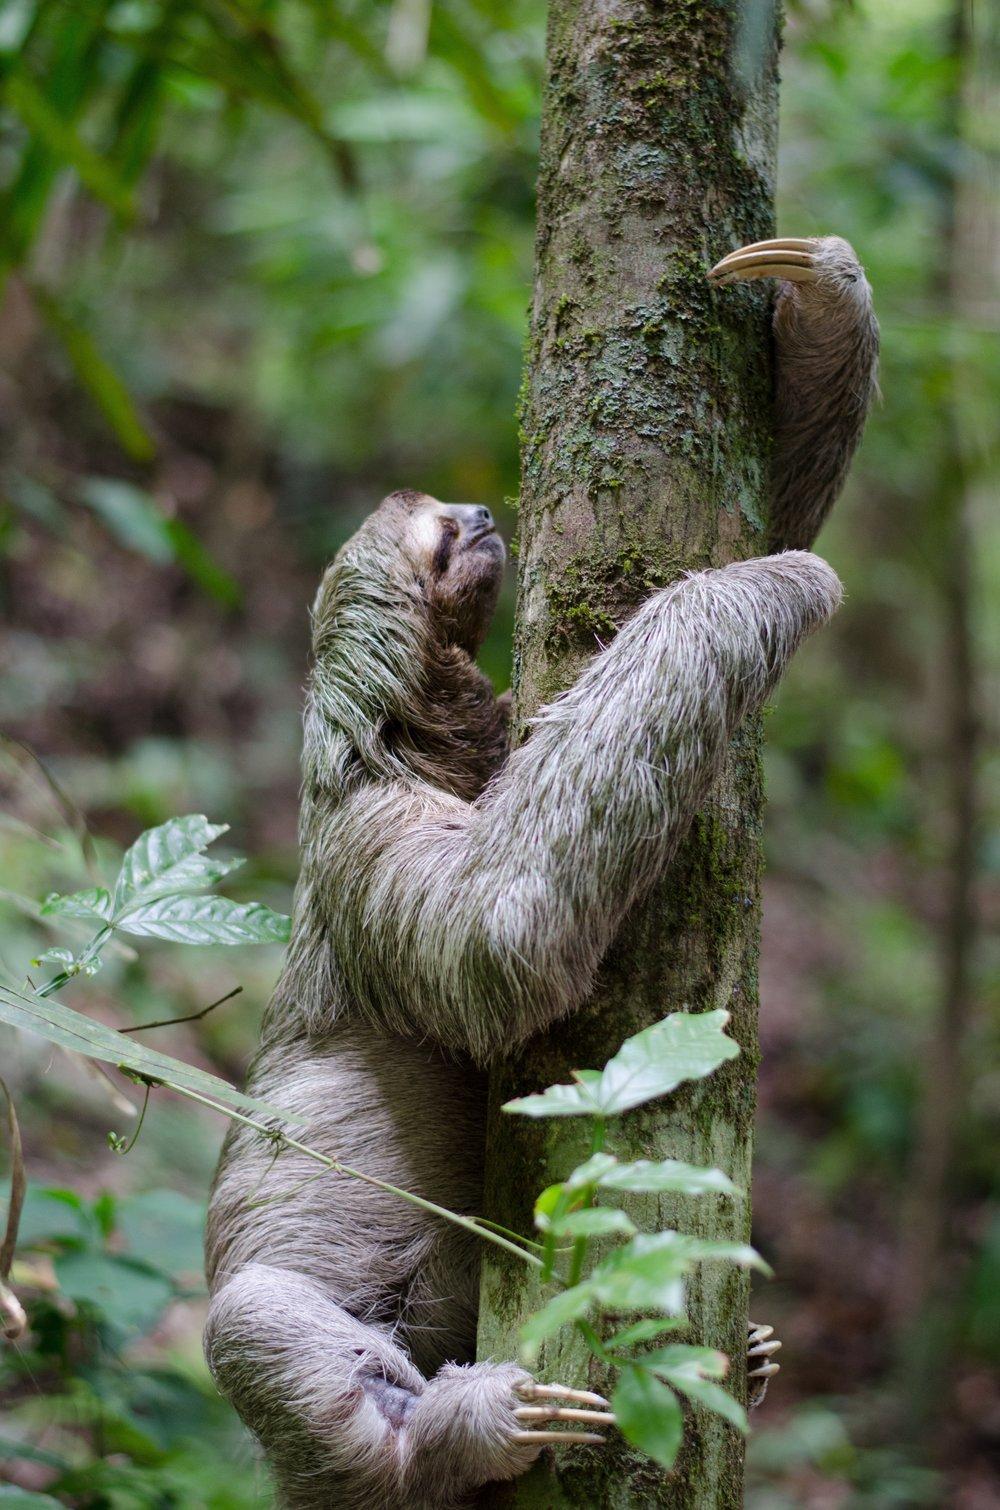 Sloth going to the bathroom - Sloth Haiku